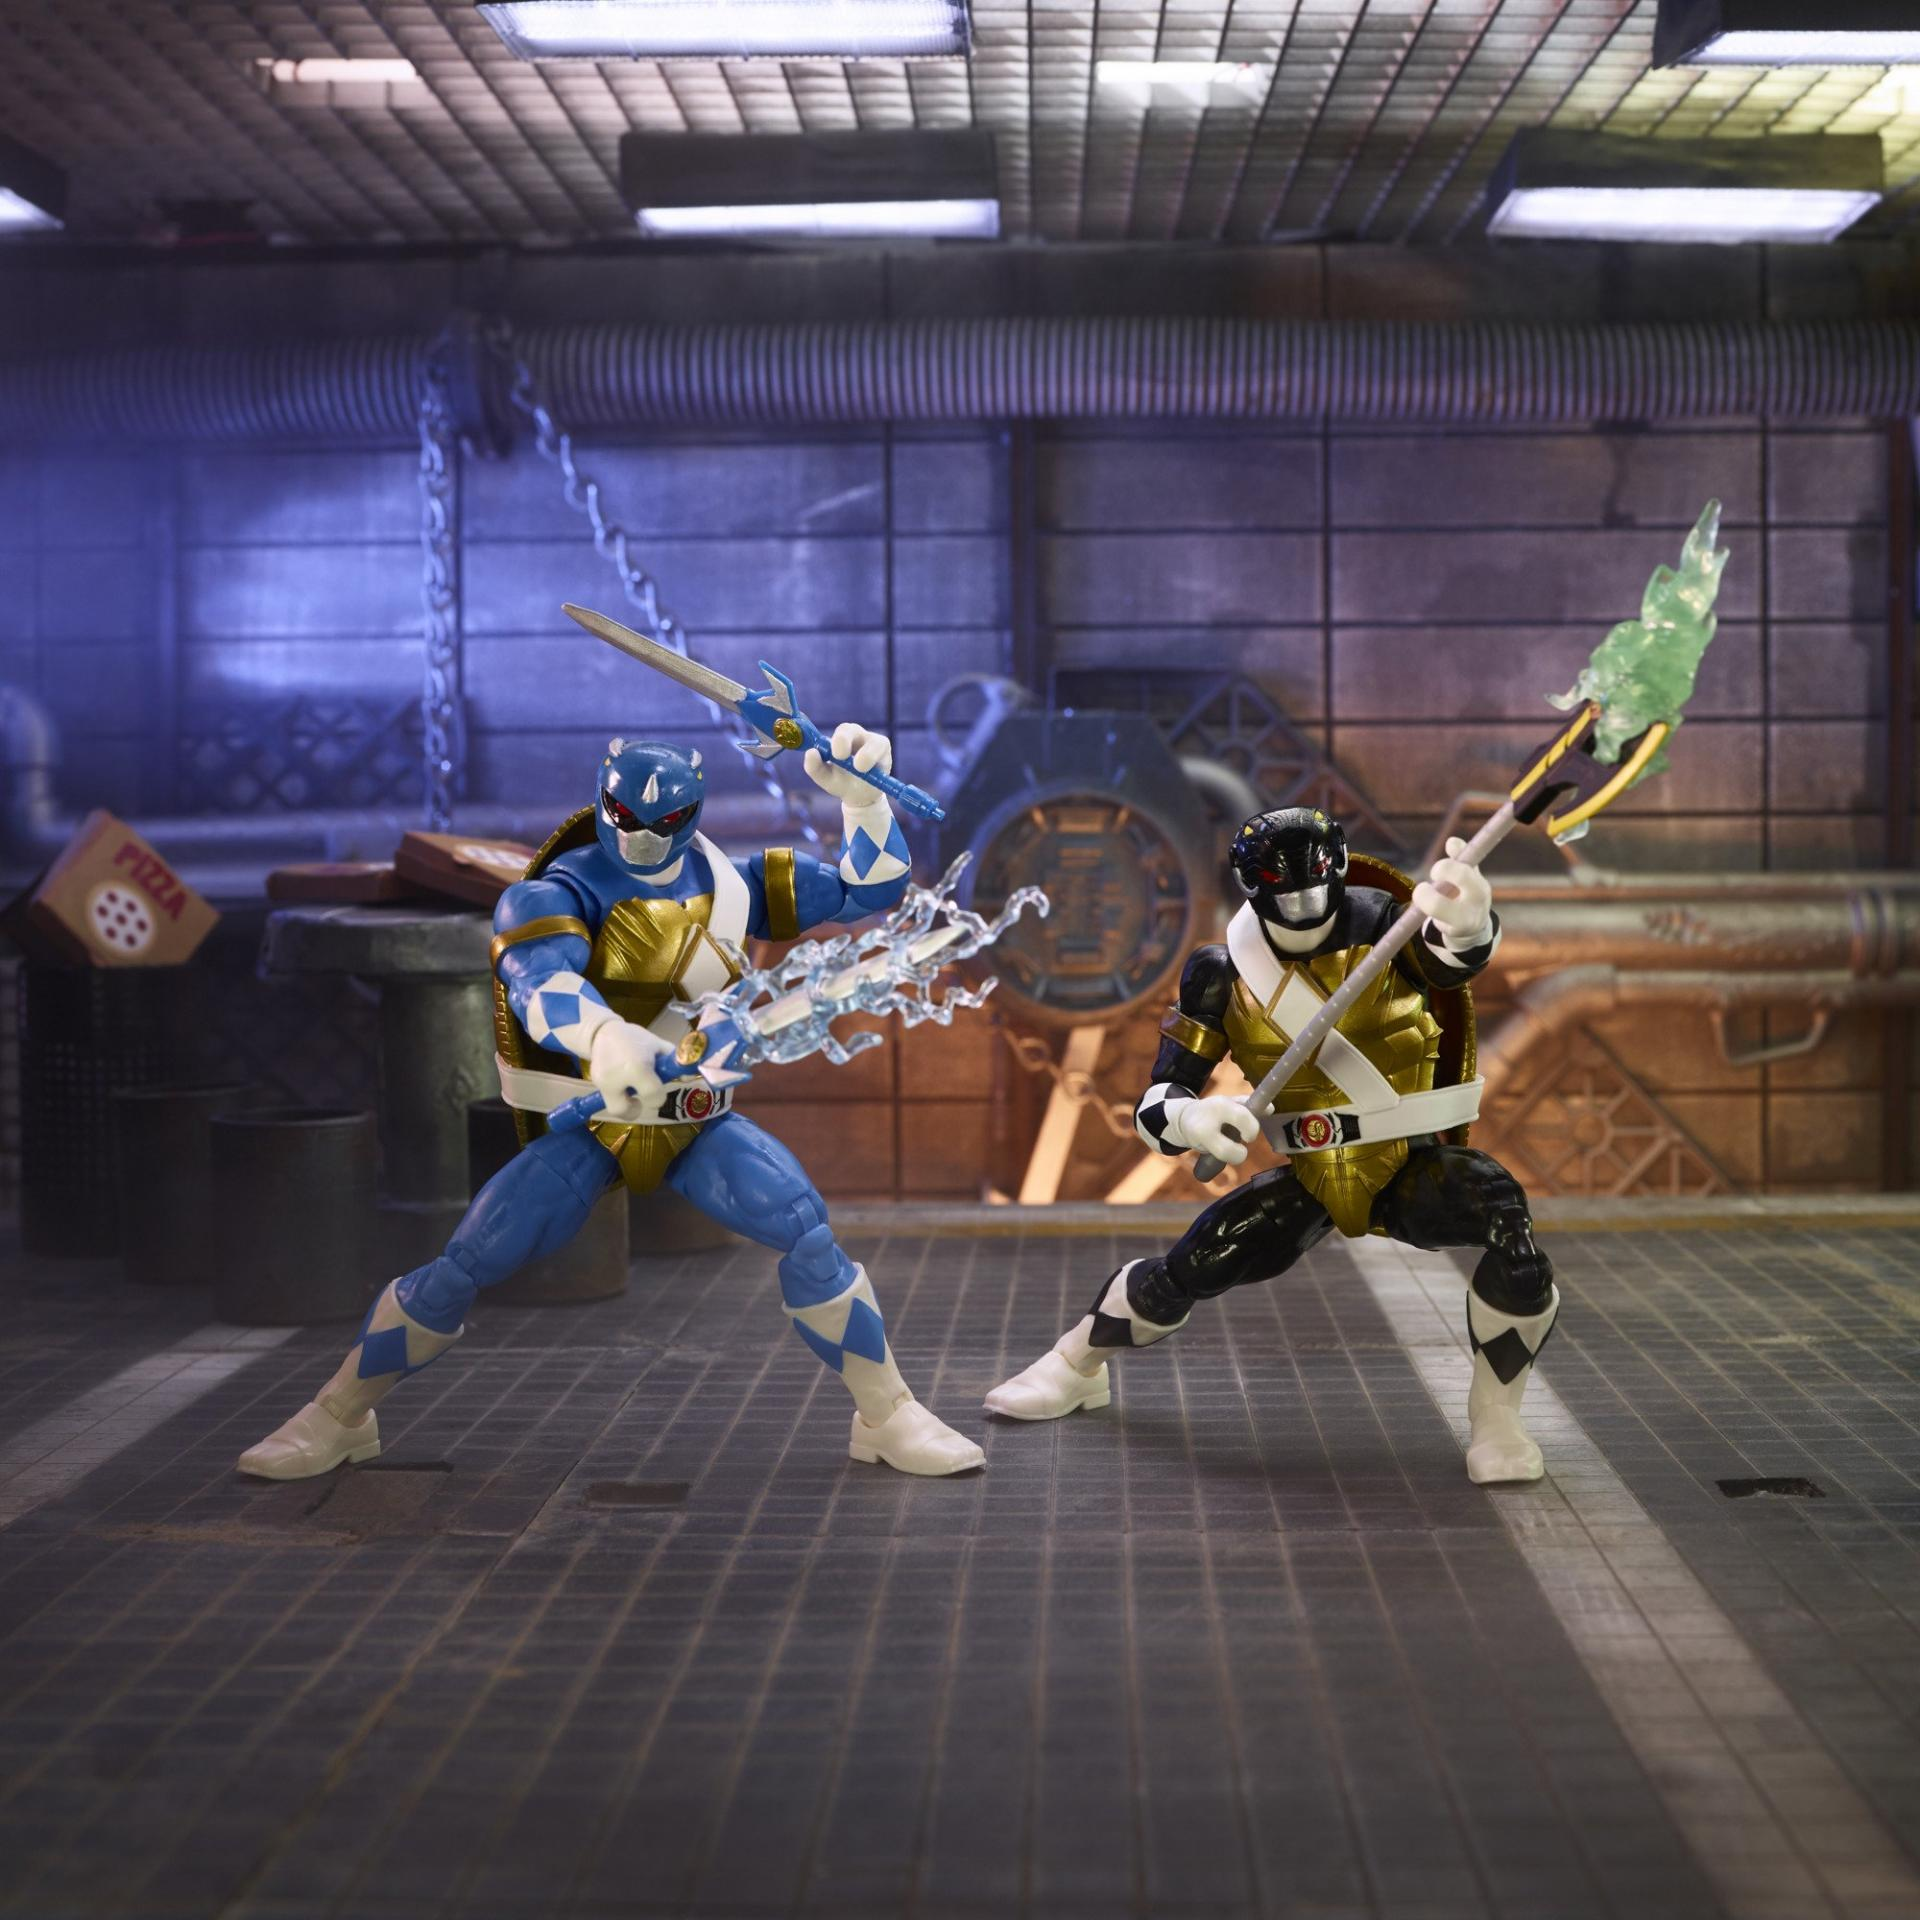 Power rangers tortue ninja tmnt lightning collection morphed donatello morphed leonardo 15cm1